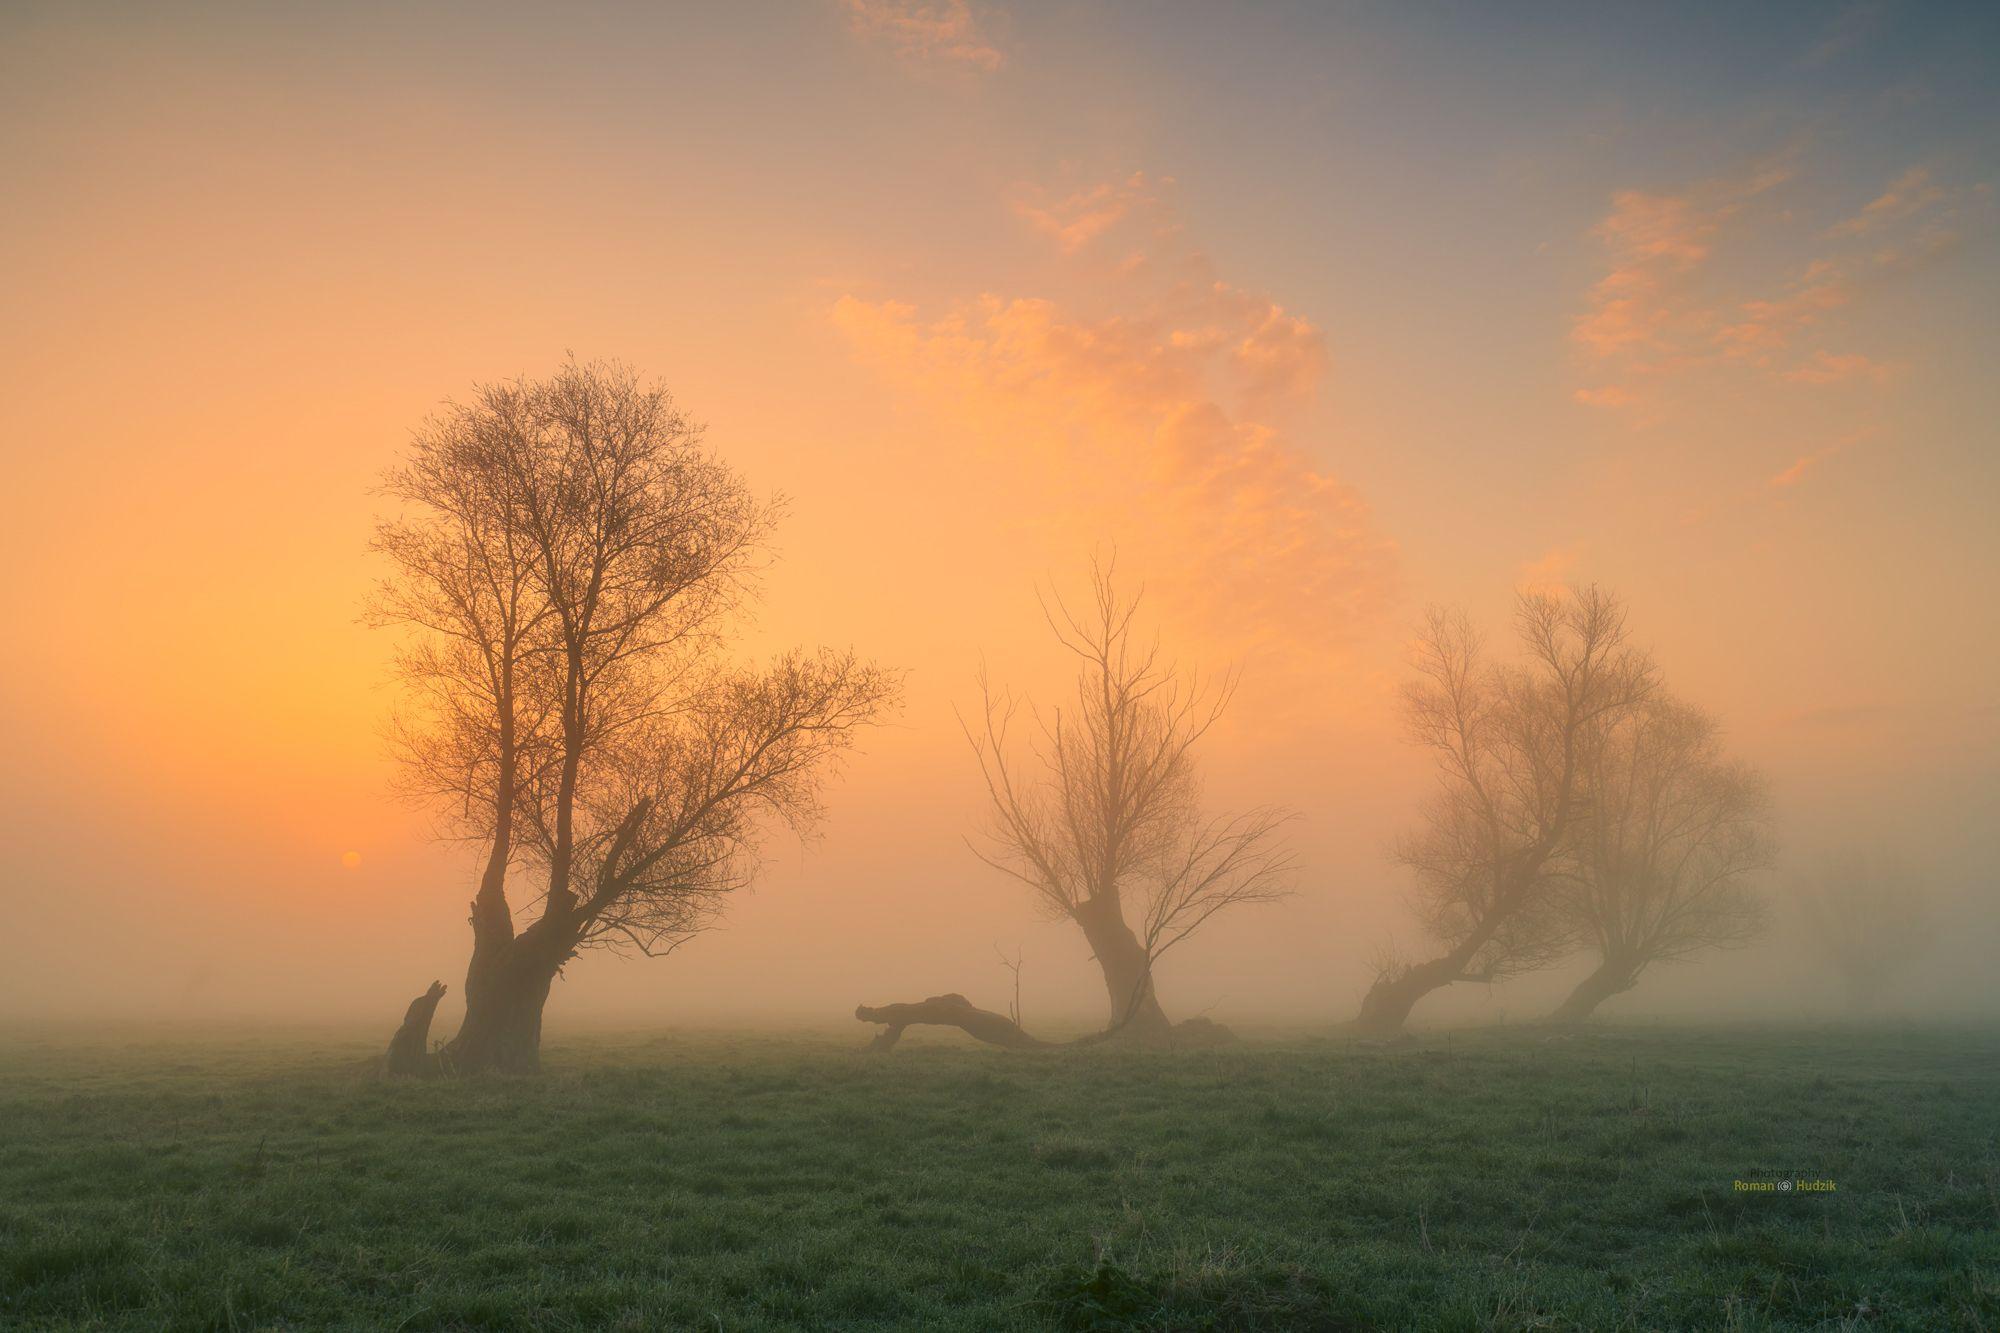 fog, landscape, sunrise, trees, sky, mystery, grass,, Hudzik Roman